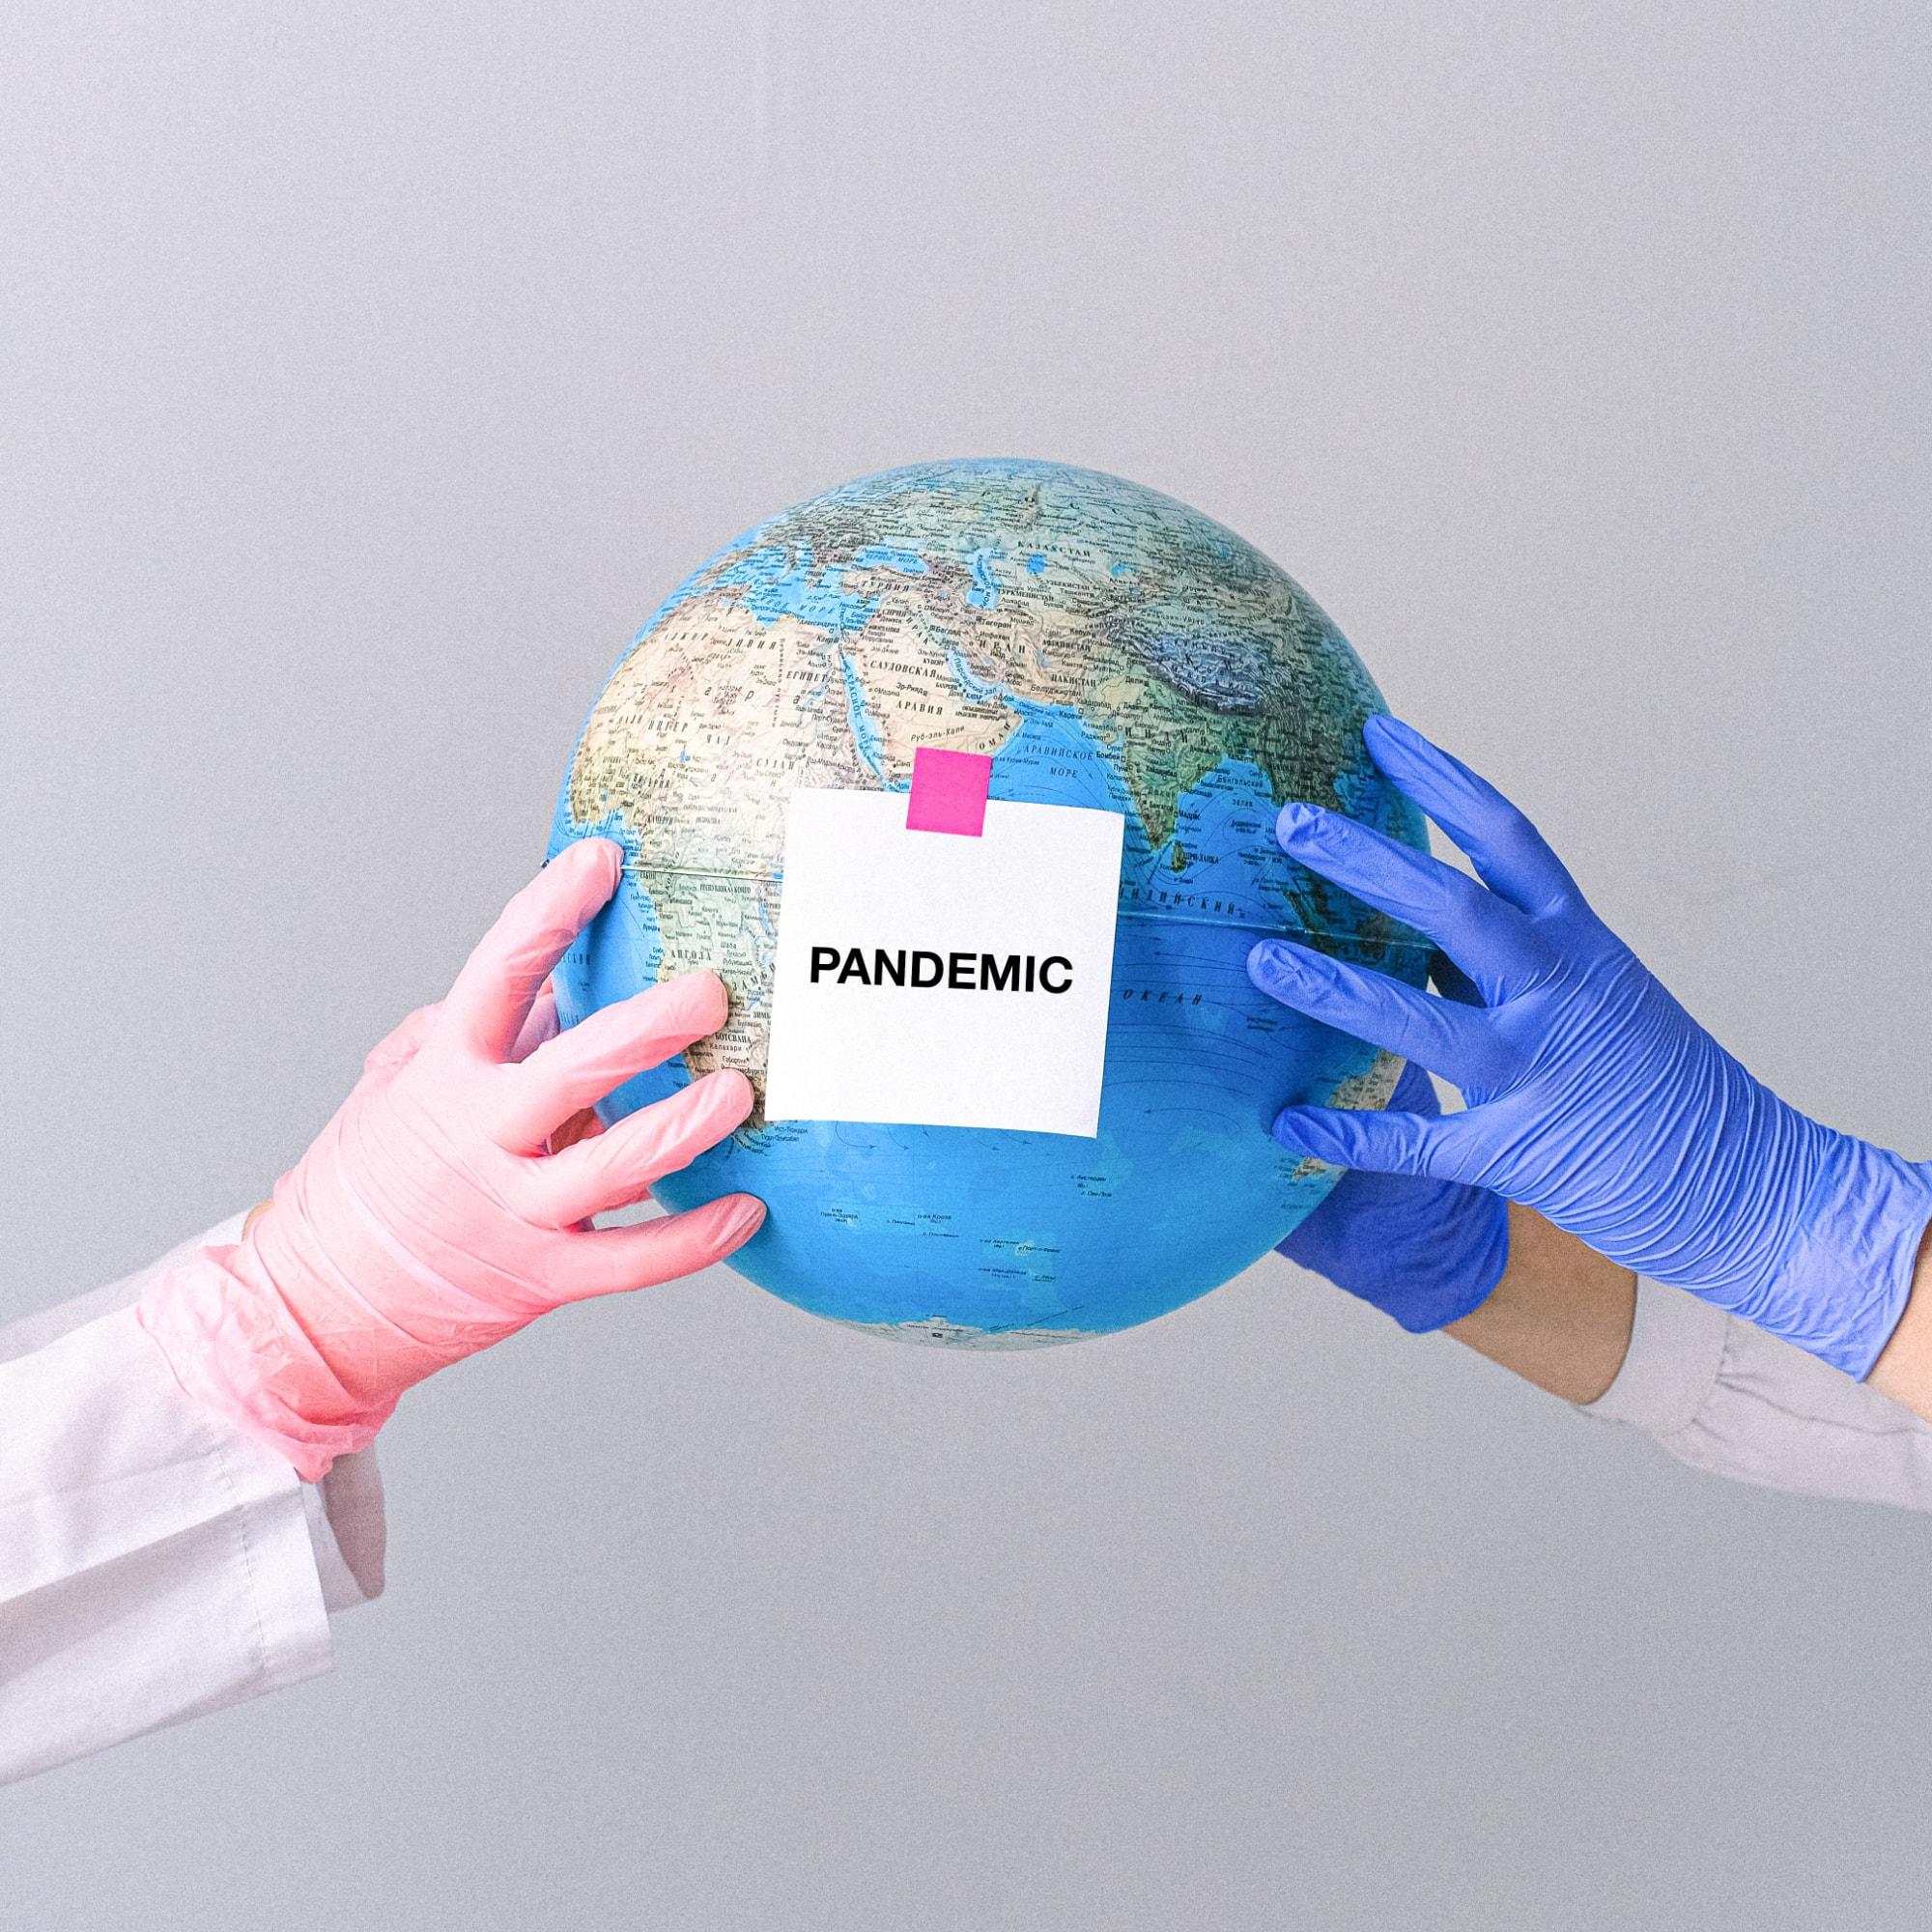 pandemic-preparedness-square